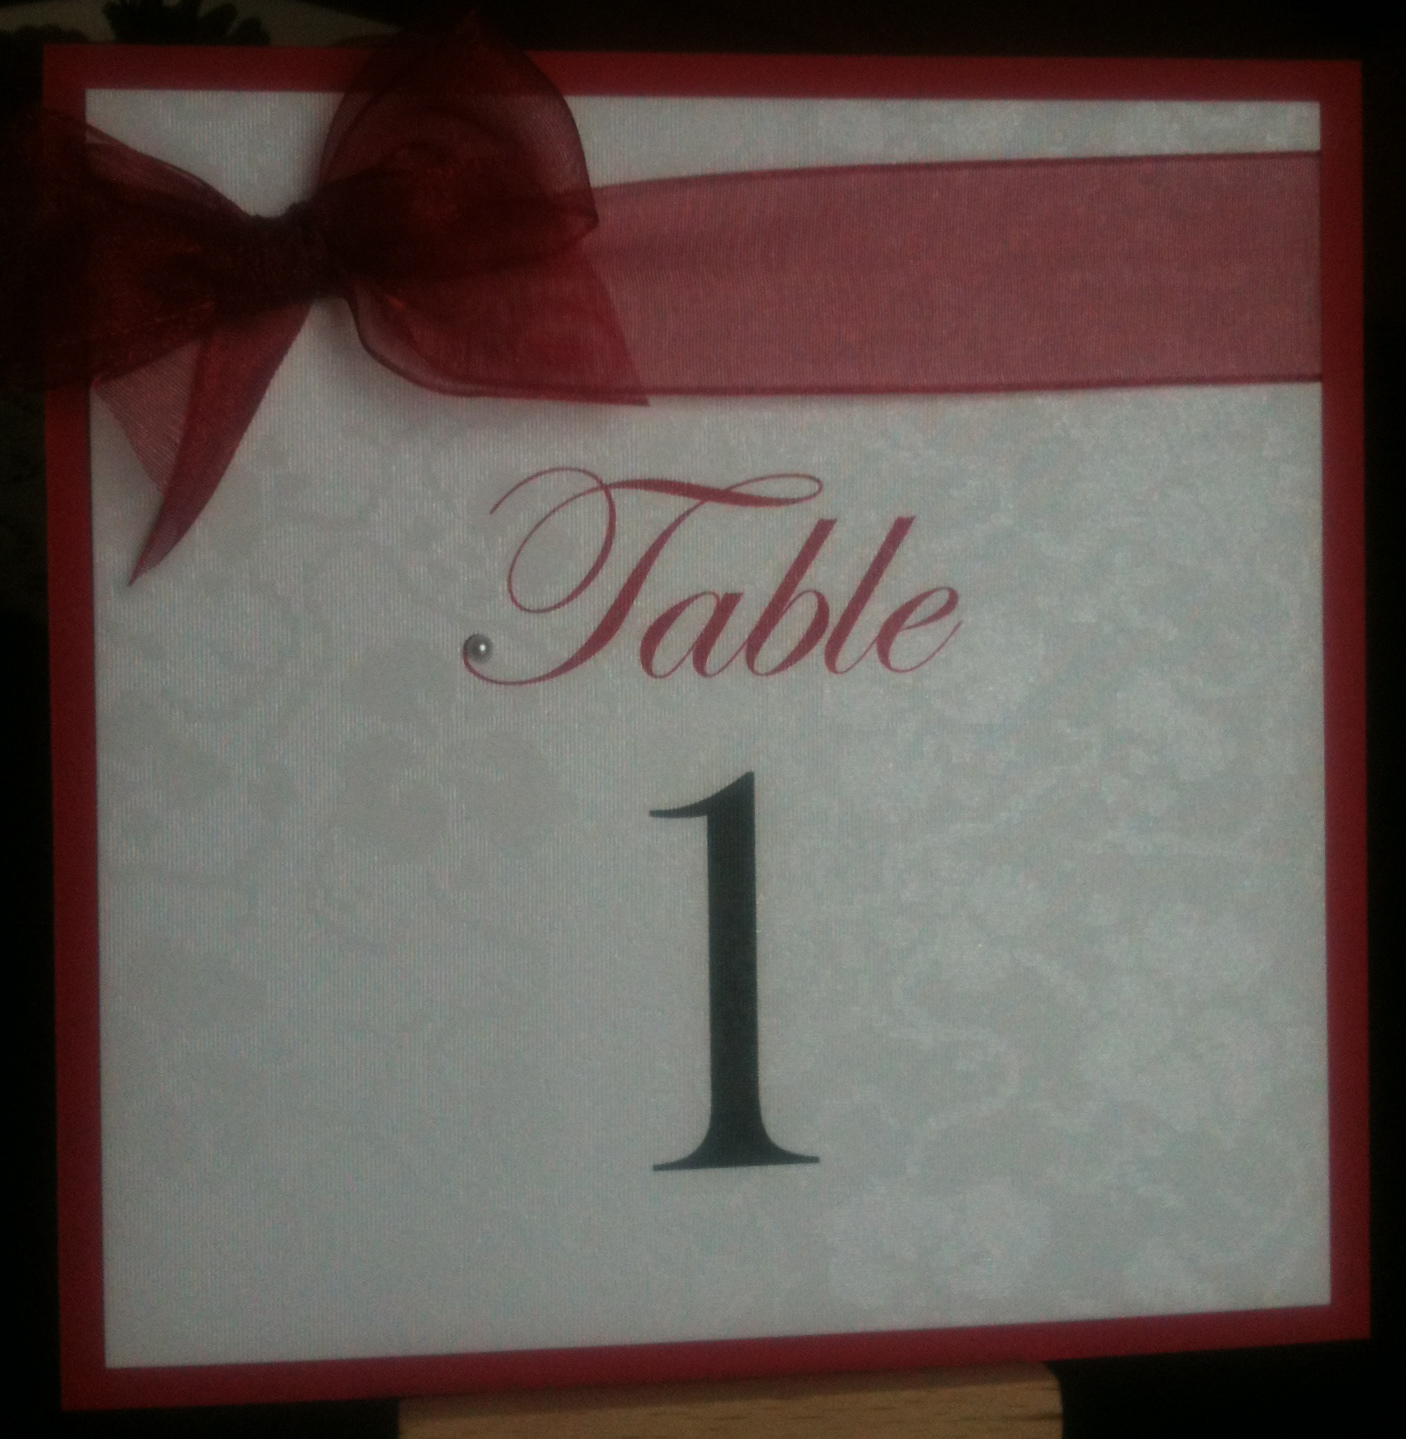 Luxury Pearla Table Number.JPG